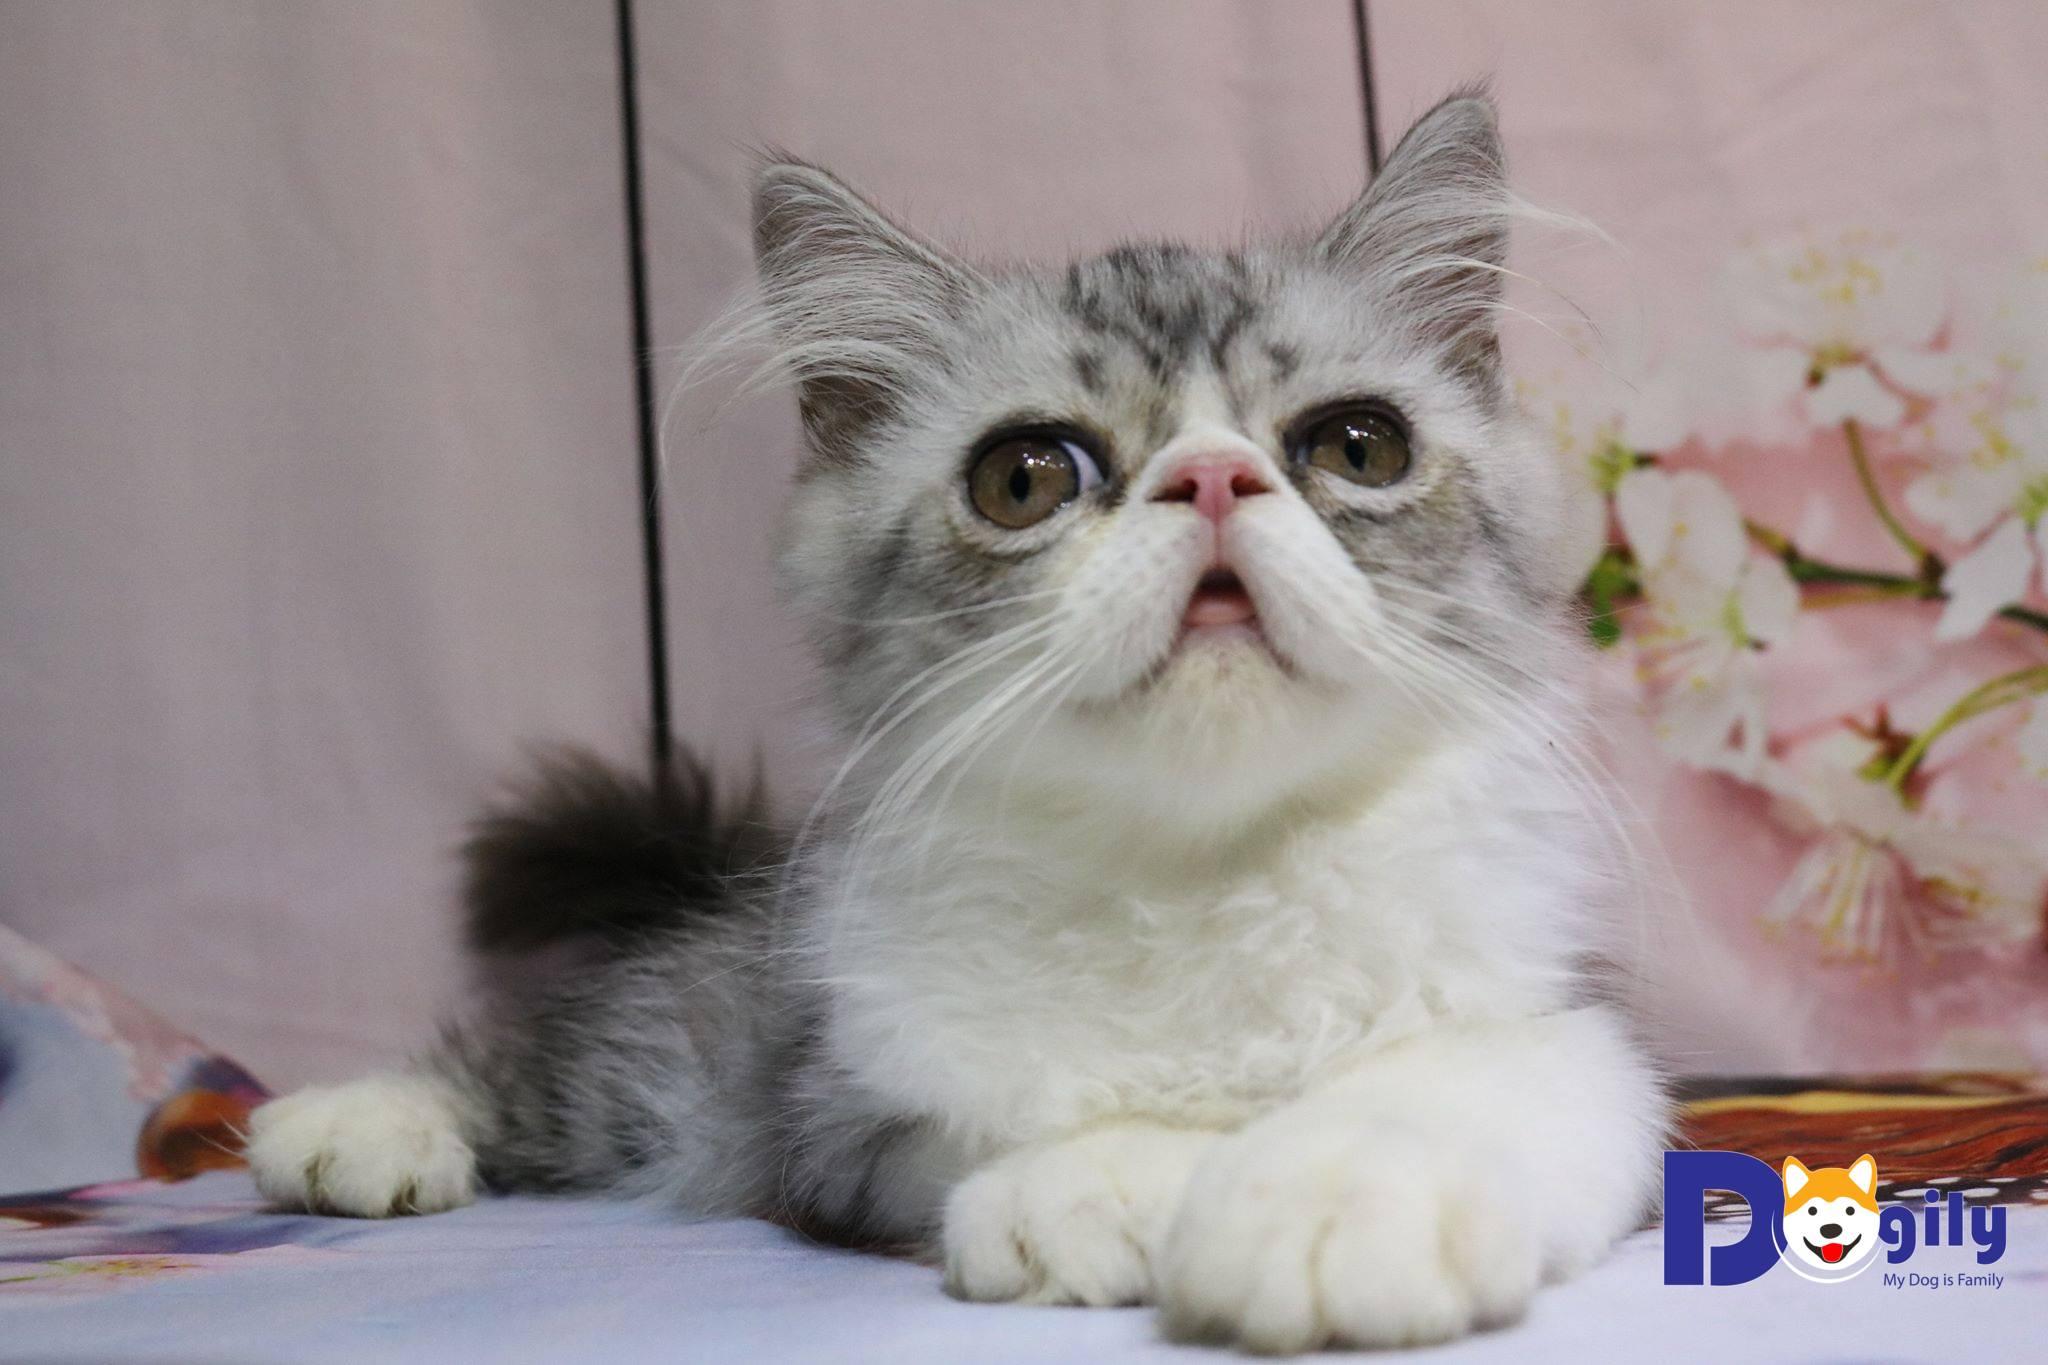 Bán mèo Exotic Dogily Petshop